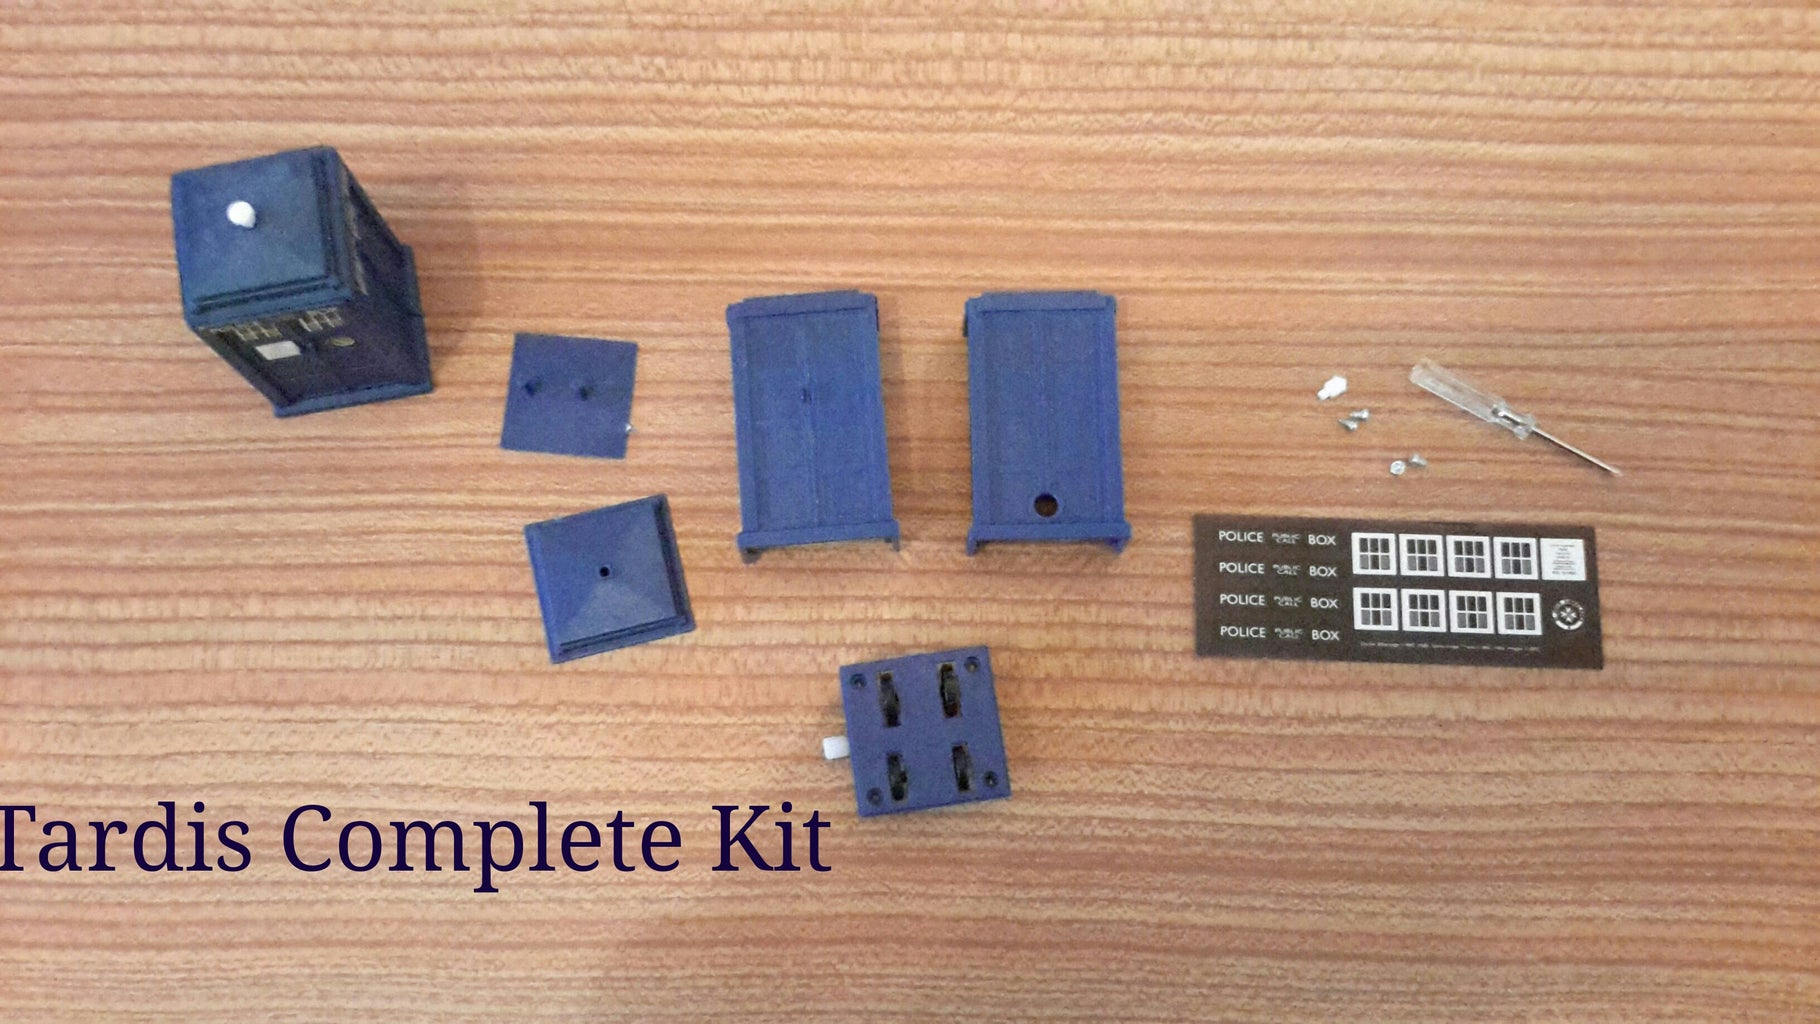 Step 1 Open Tardis Kit